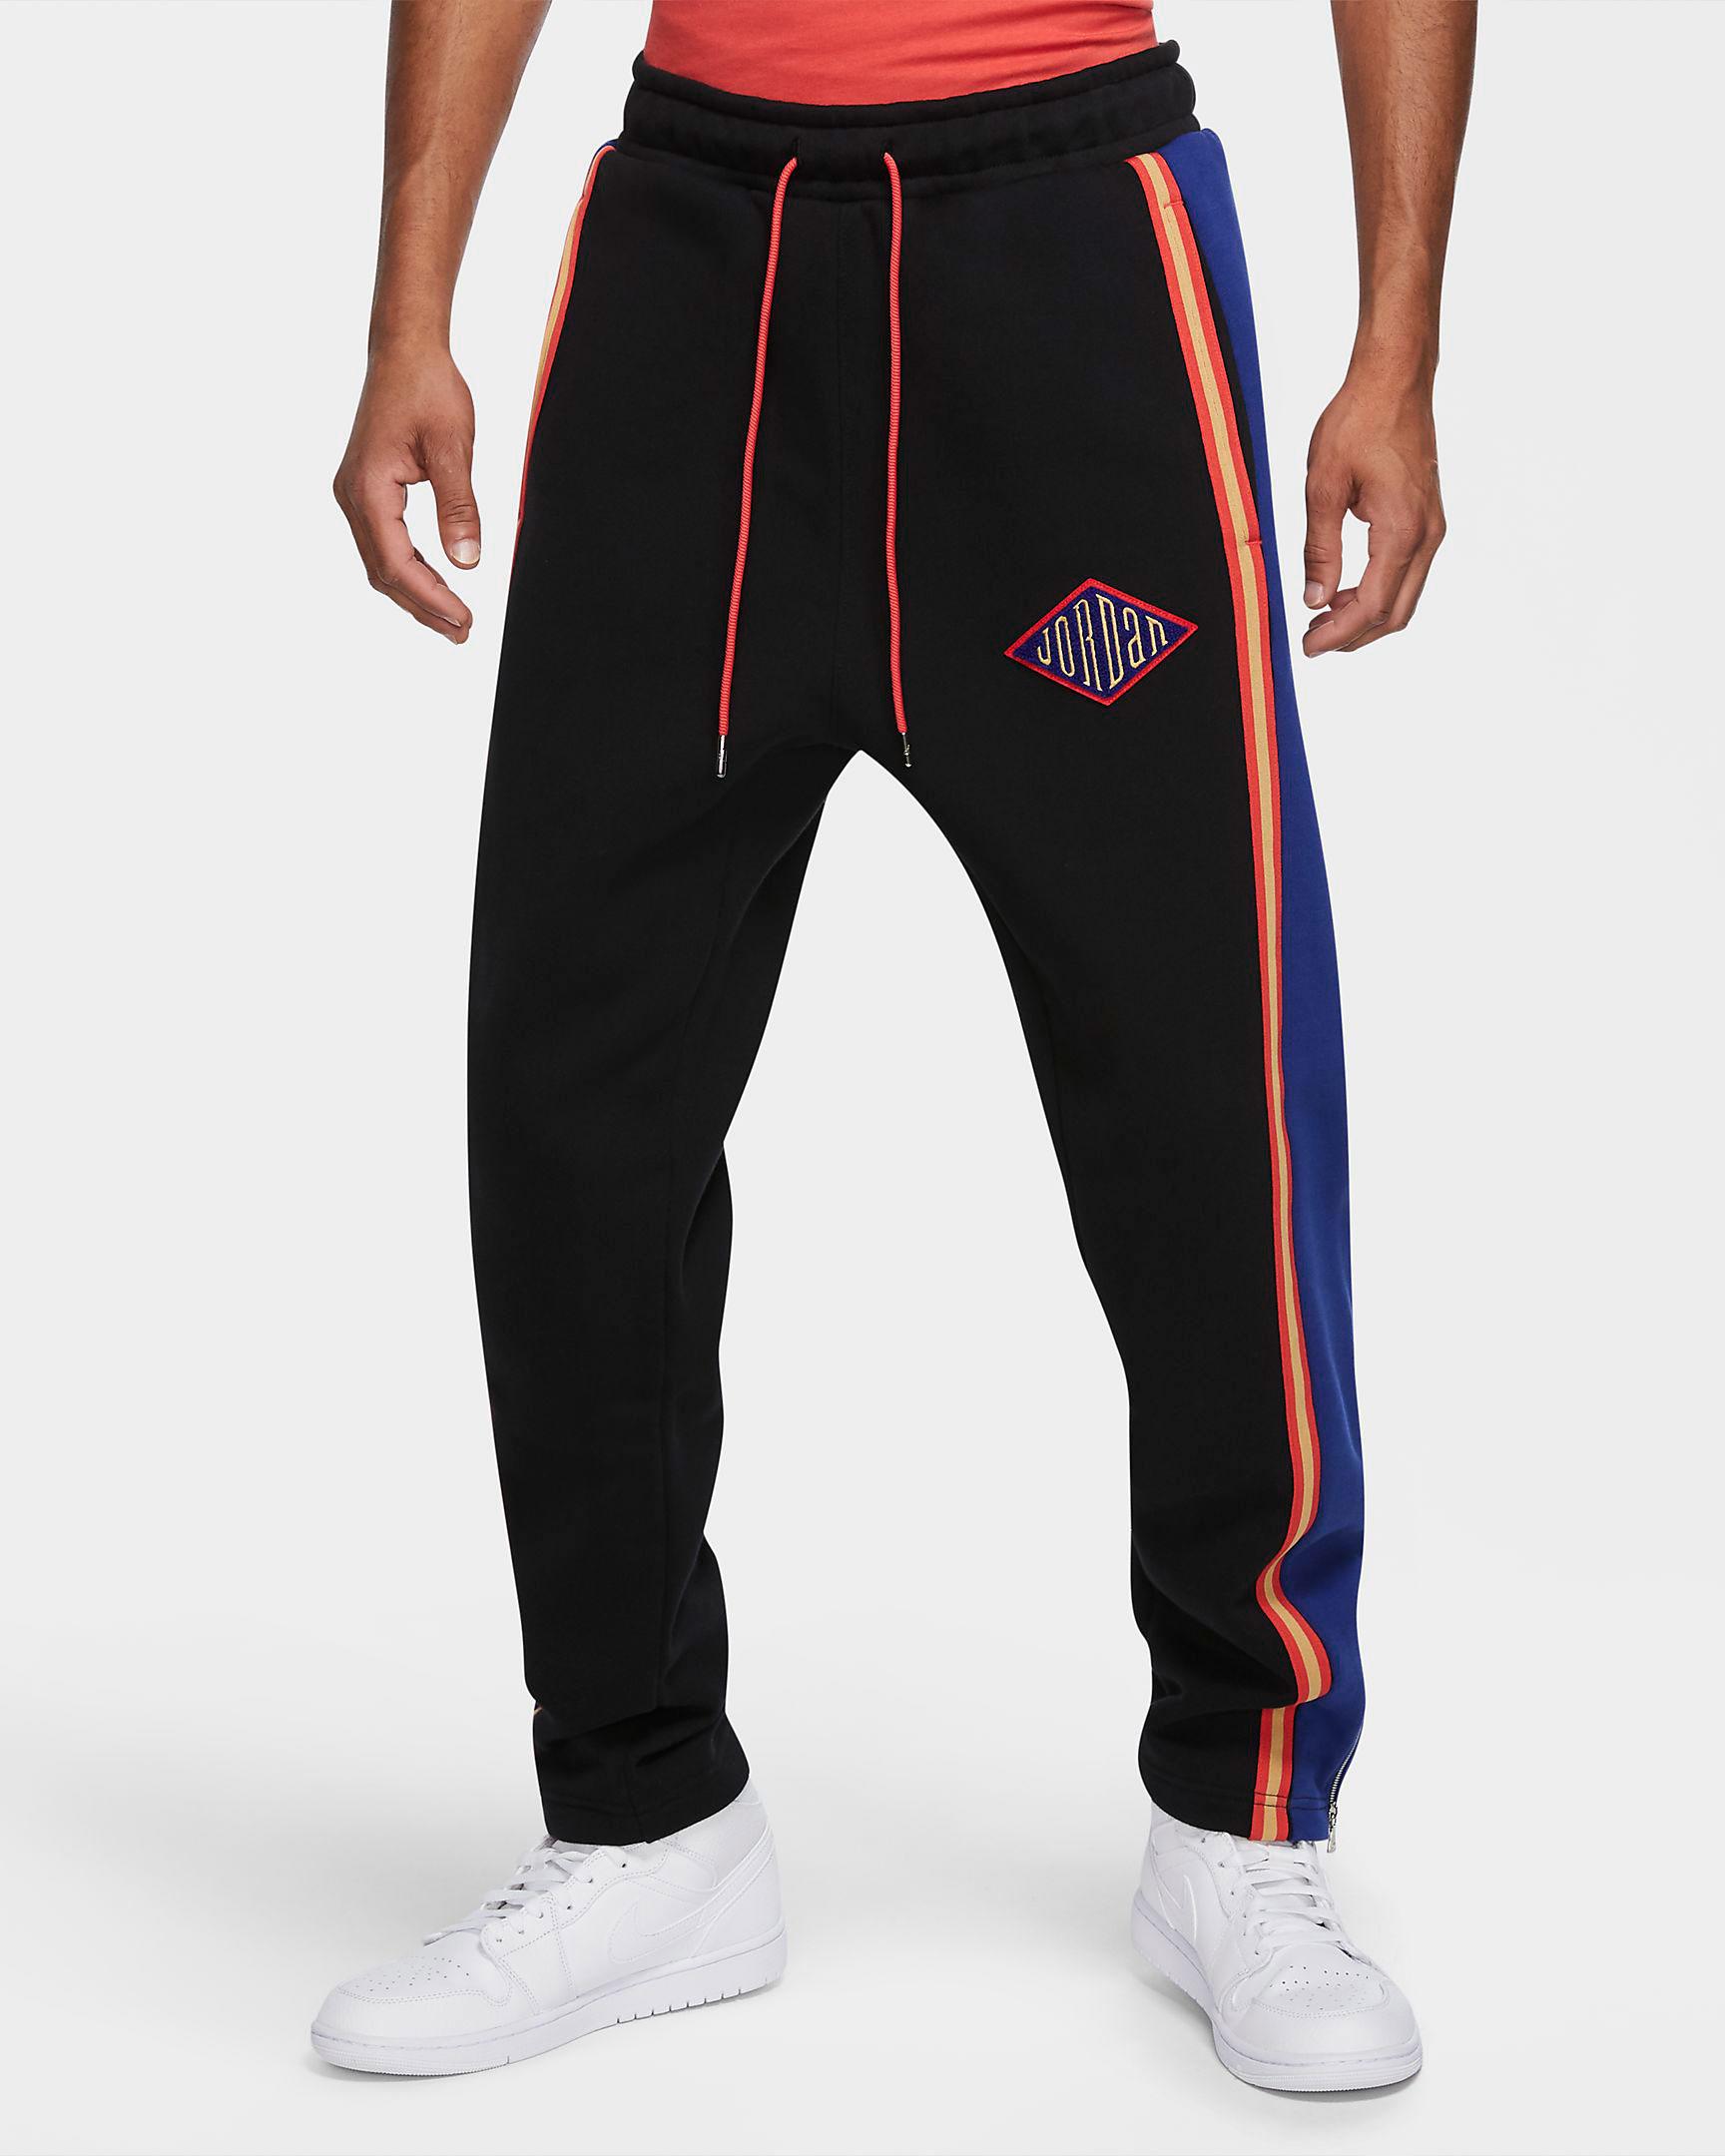 air-jordan-1-low-nothing-but-net-pants-match-1